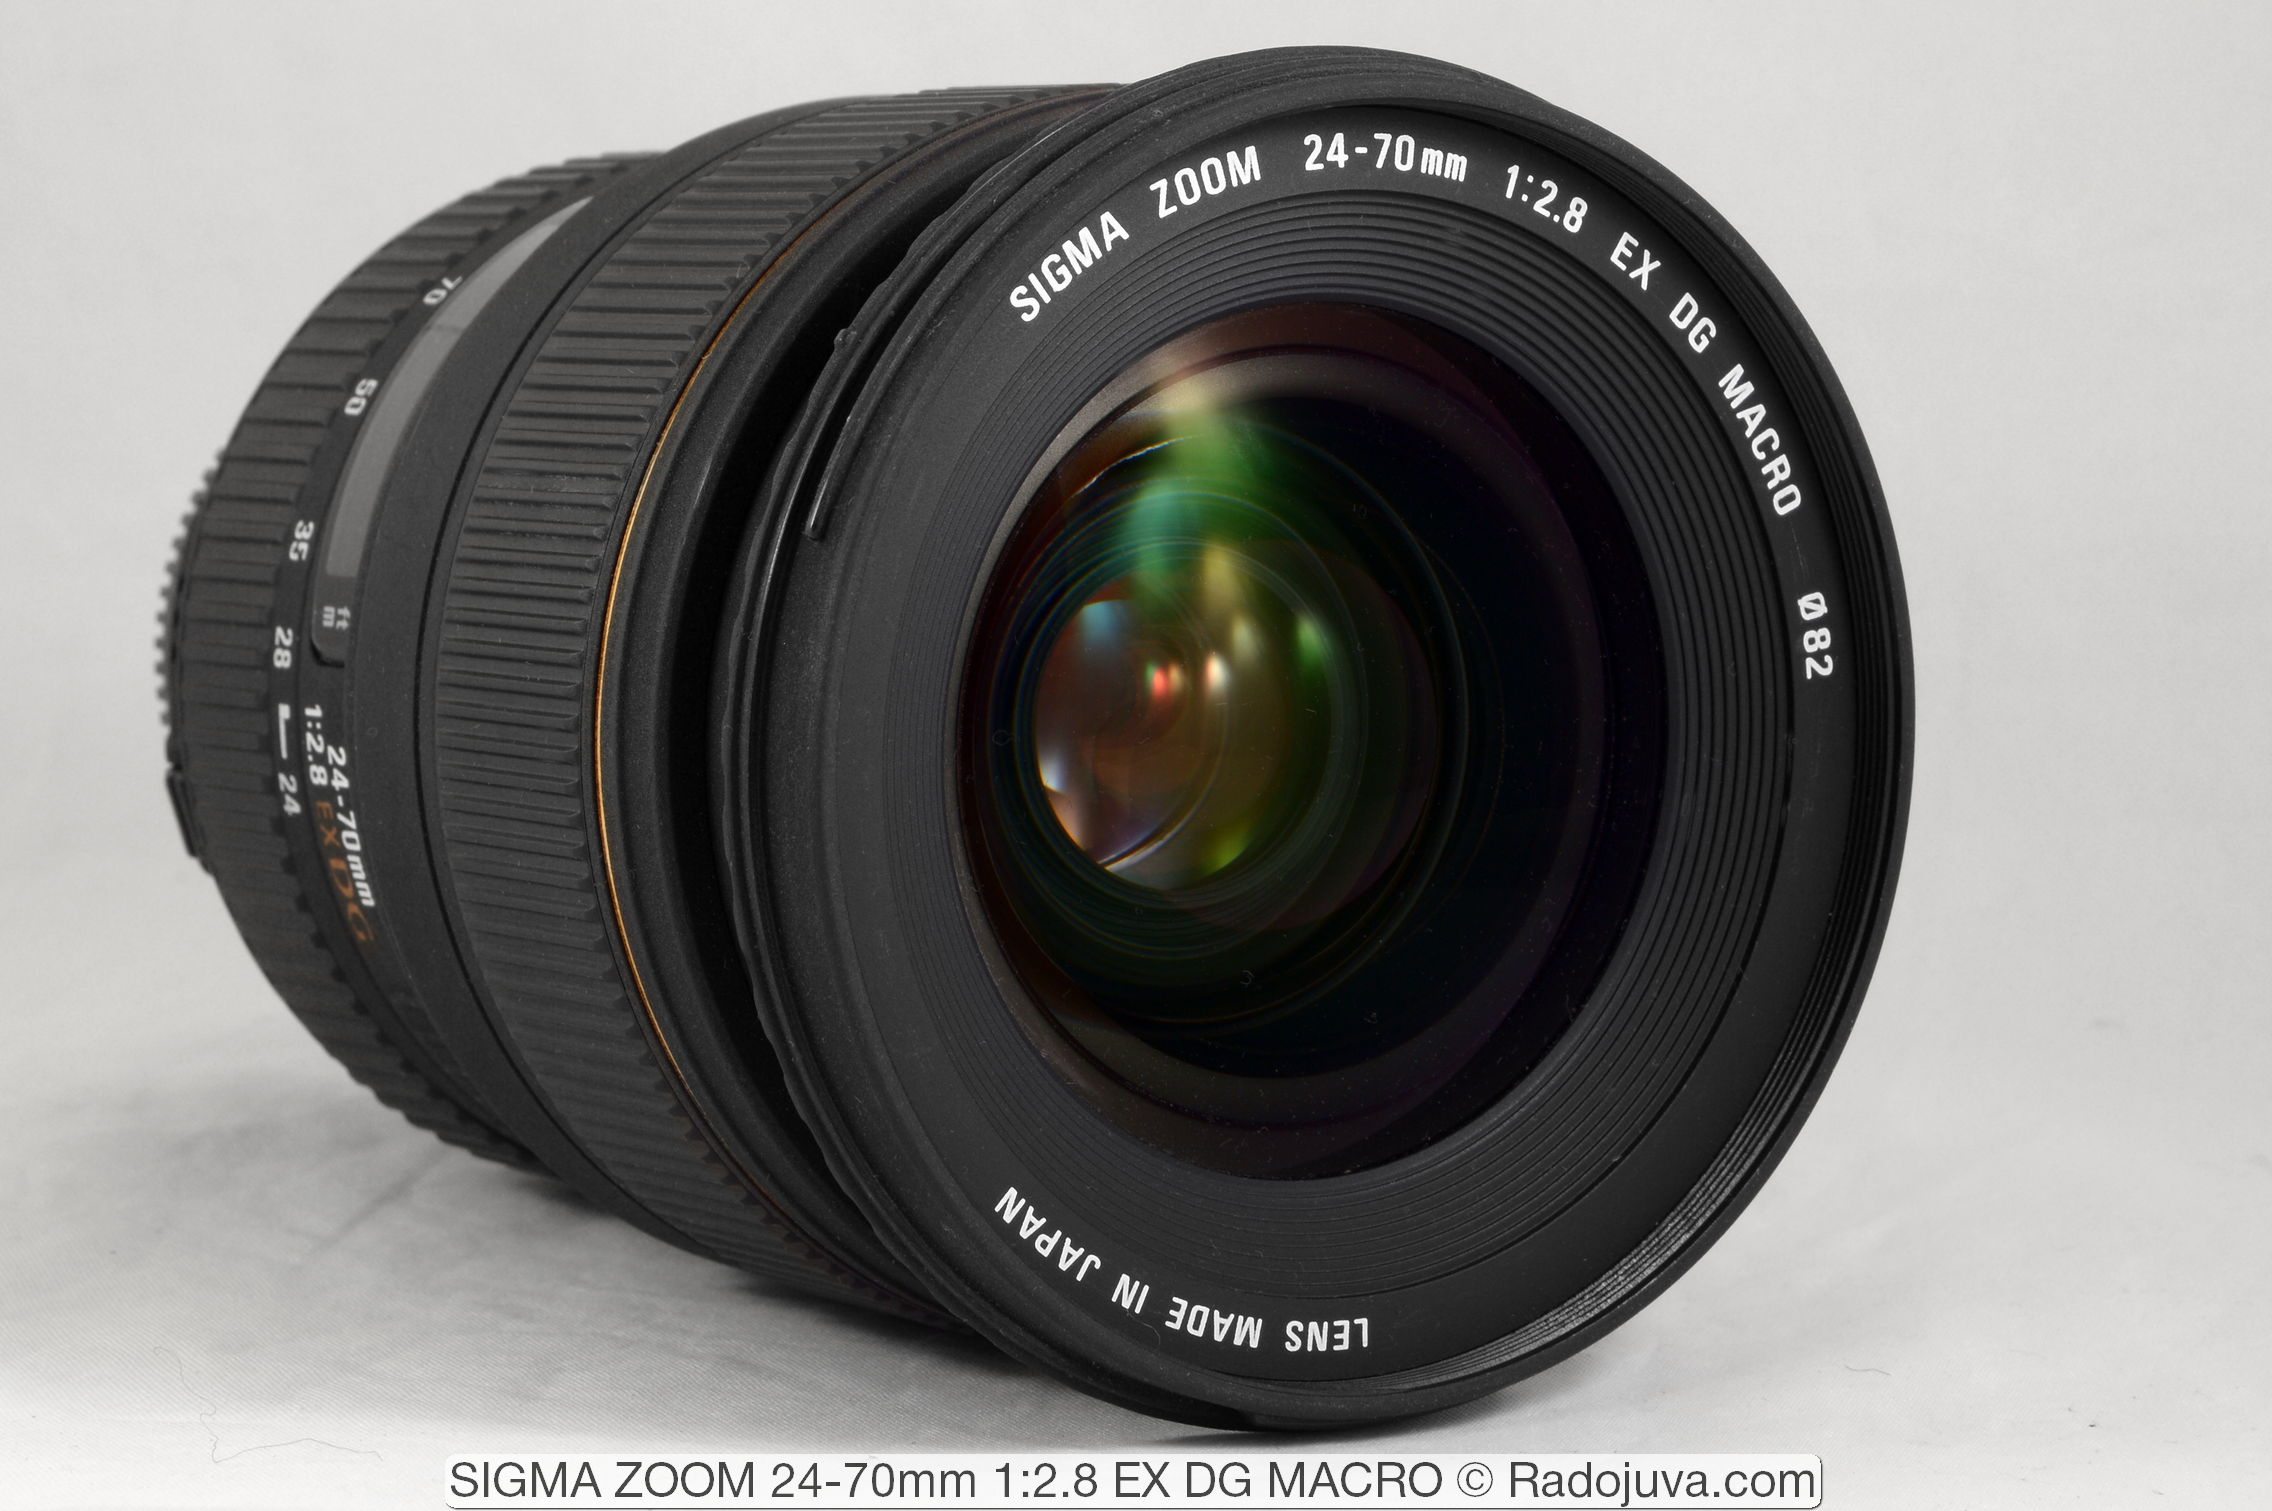 SIGMA ZOOM 24-70mm 1:2.8 EX DG MACRO